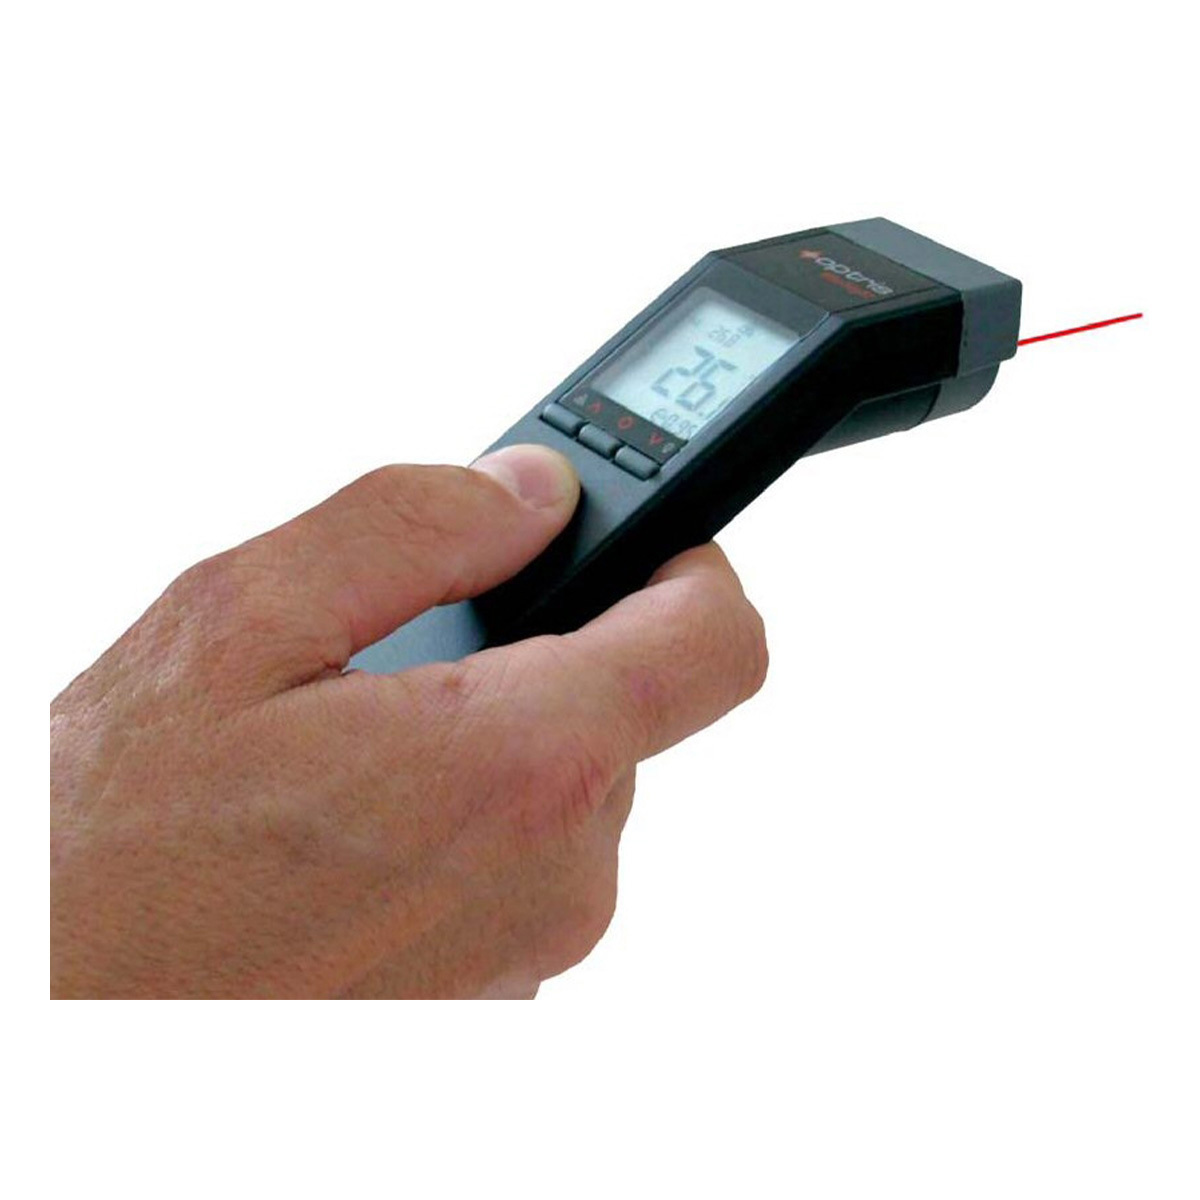 31-1118-infrarot-thermometer-proscan-anwendung-1200x1200px.jpg